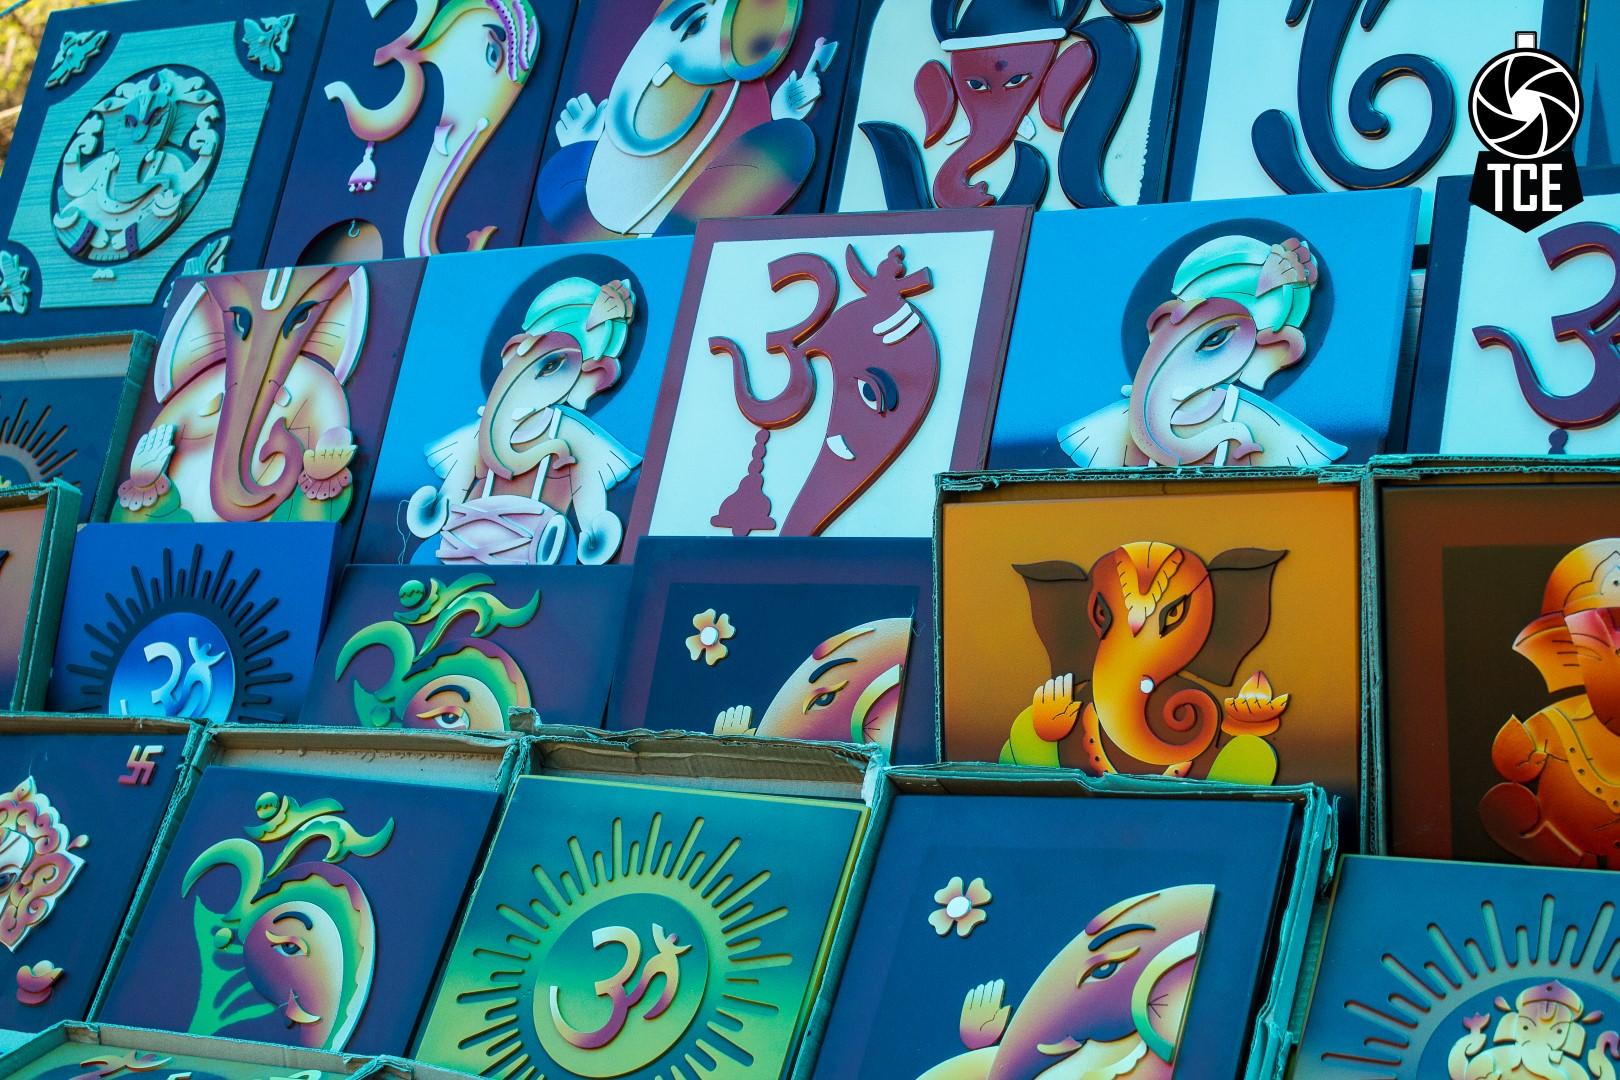 On Sale, Souvenirs at Elephanta